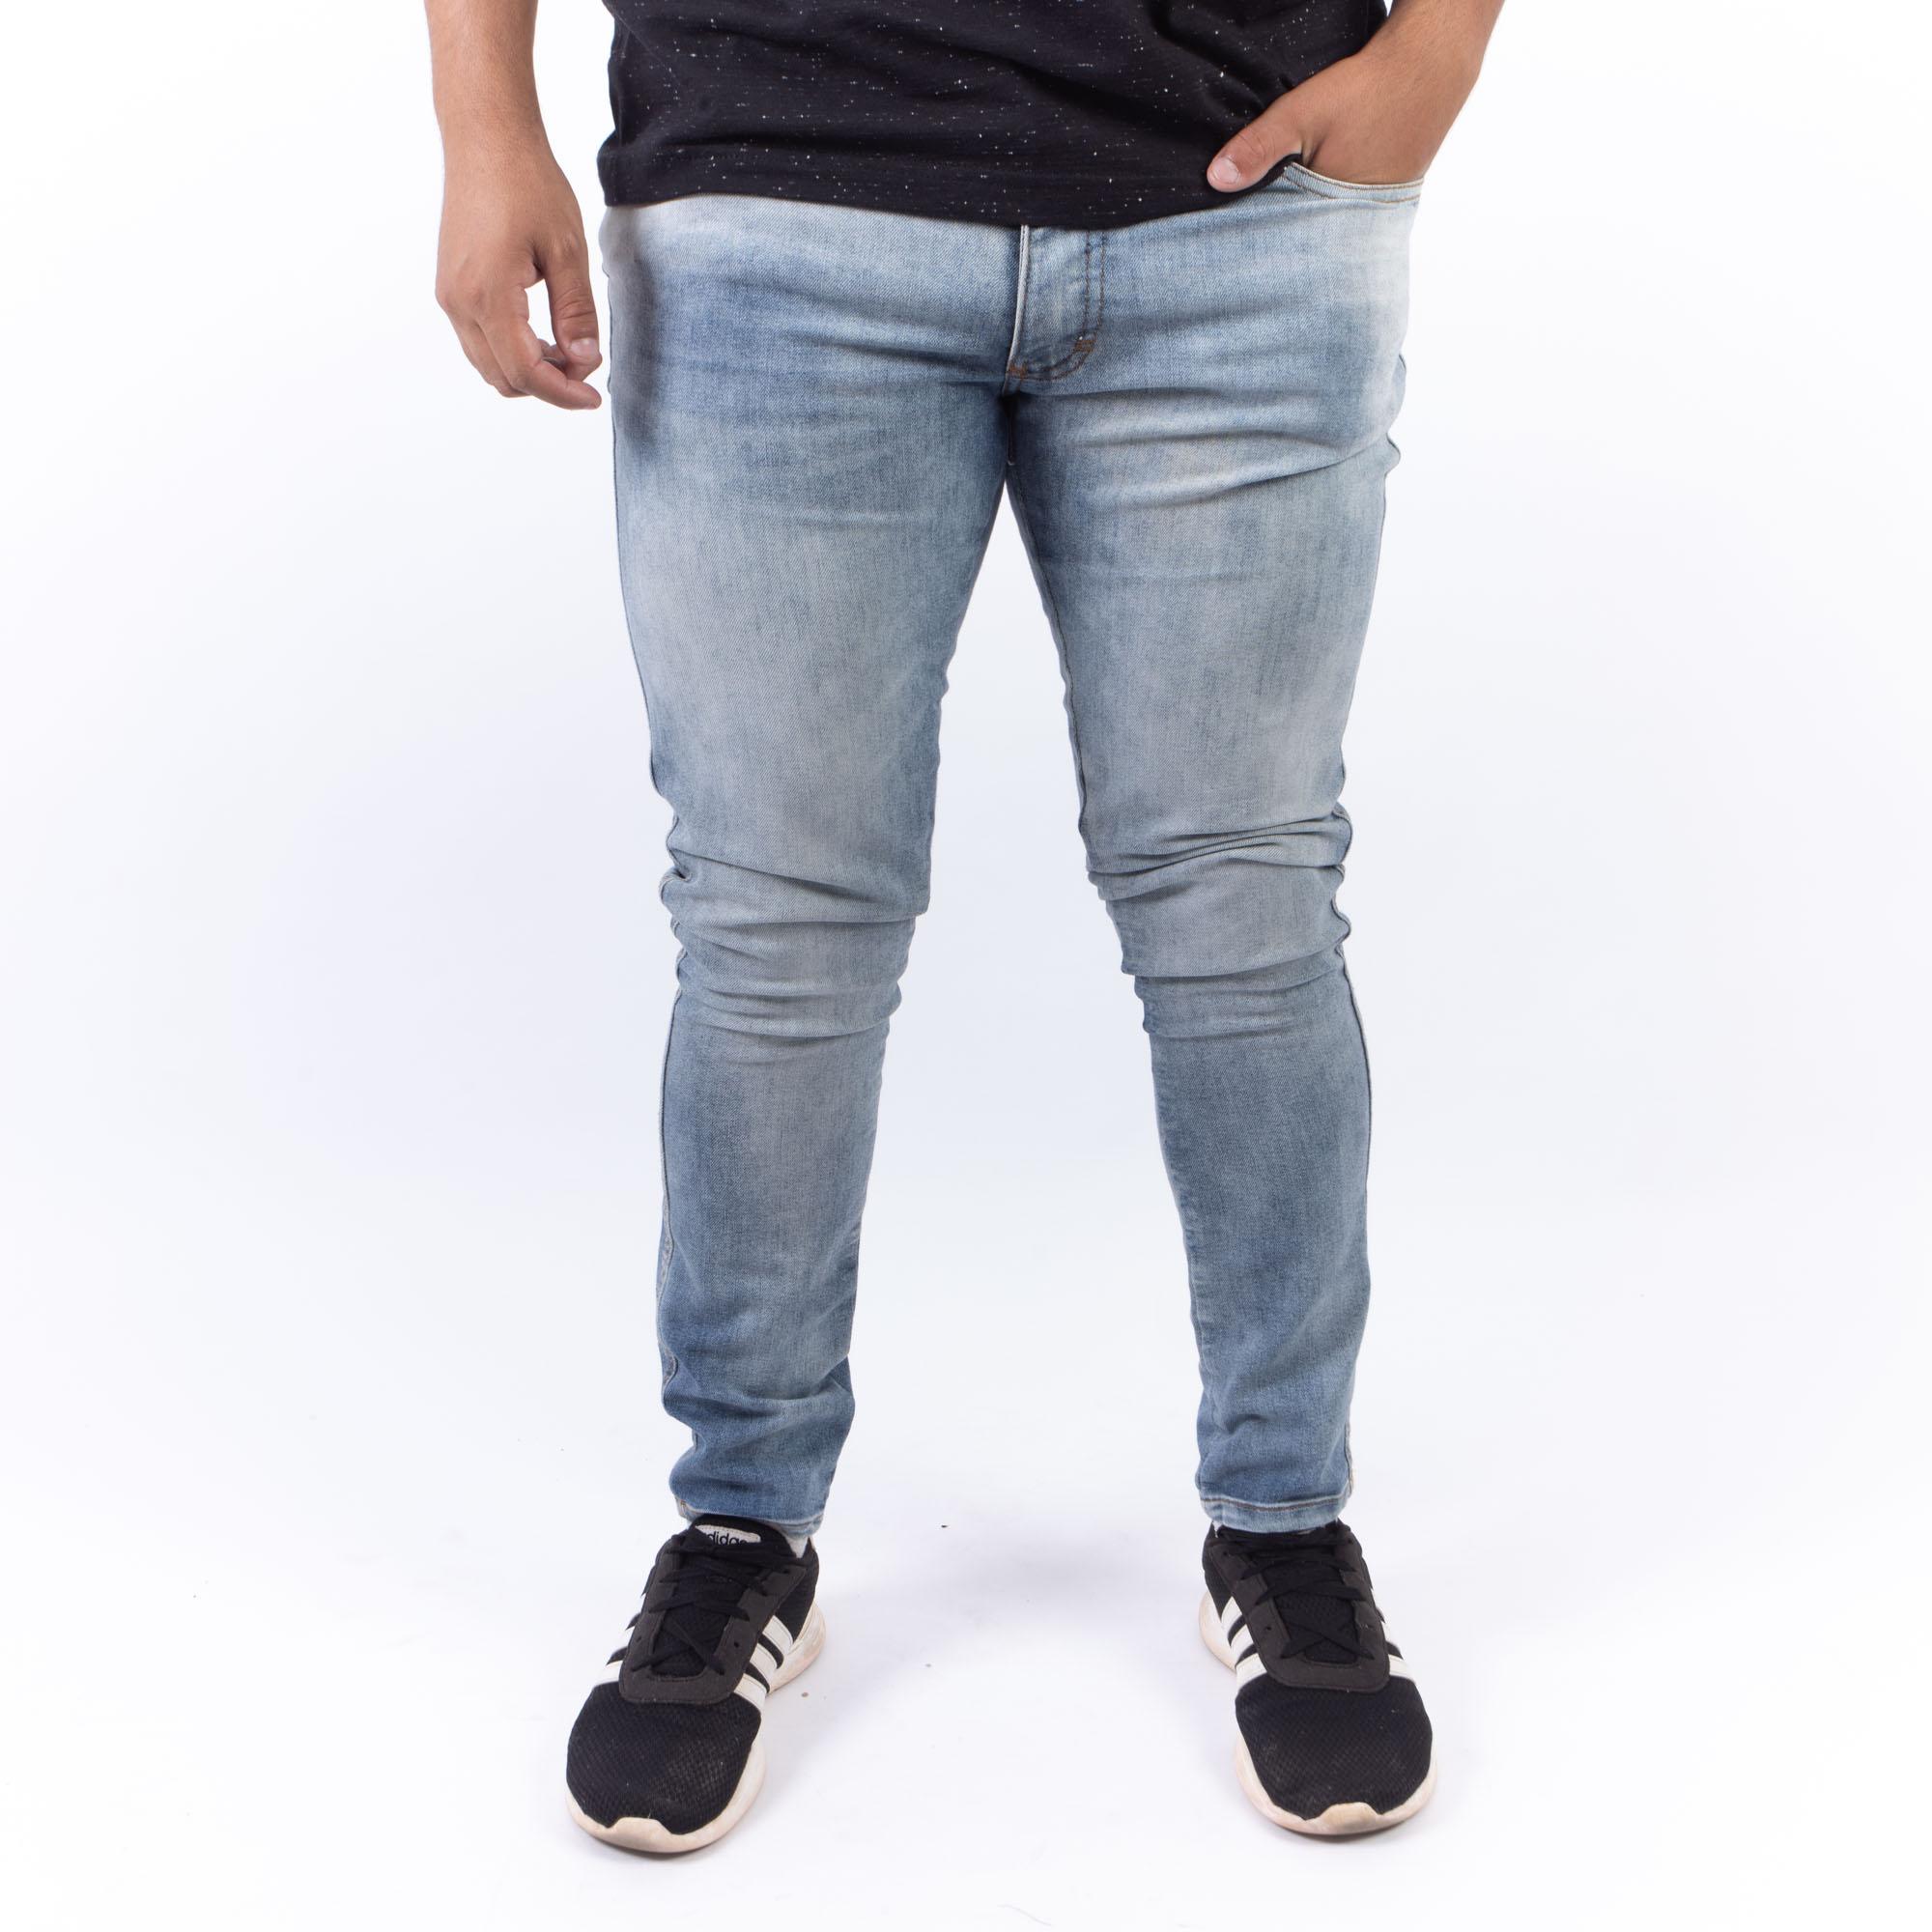 Calça Jeans Skinny Marmorizada -Ecko Unltd